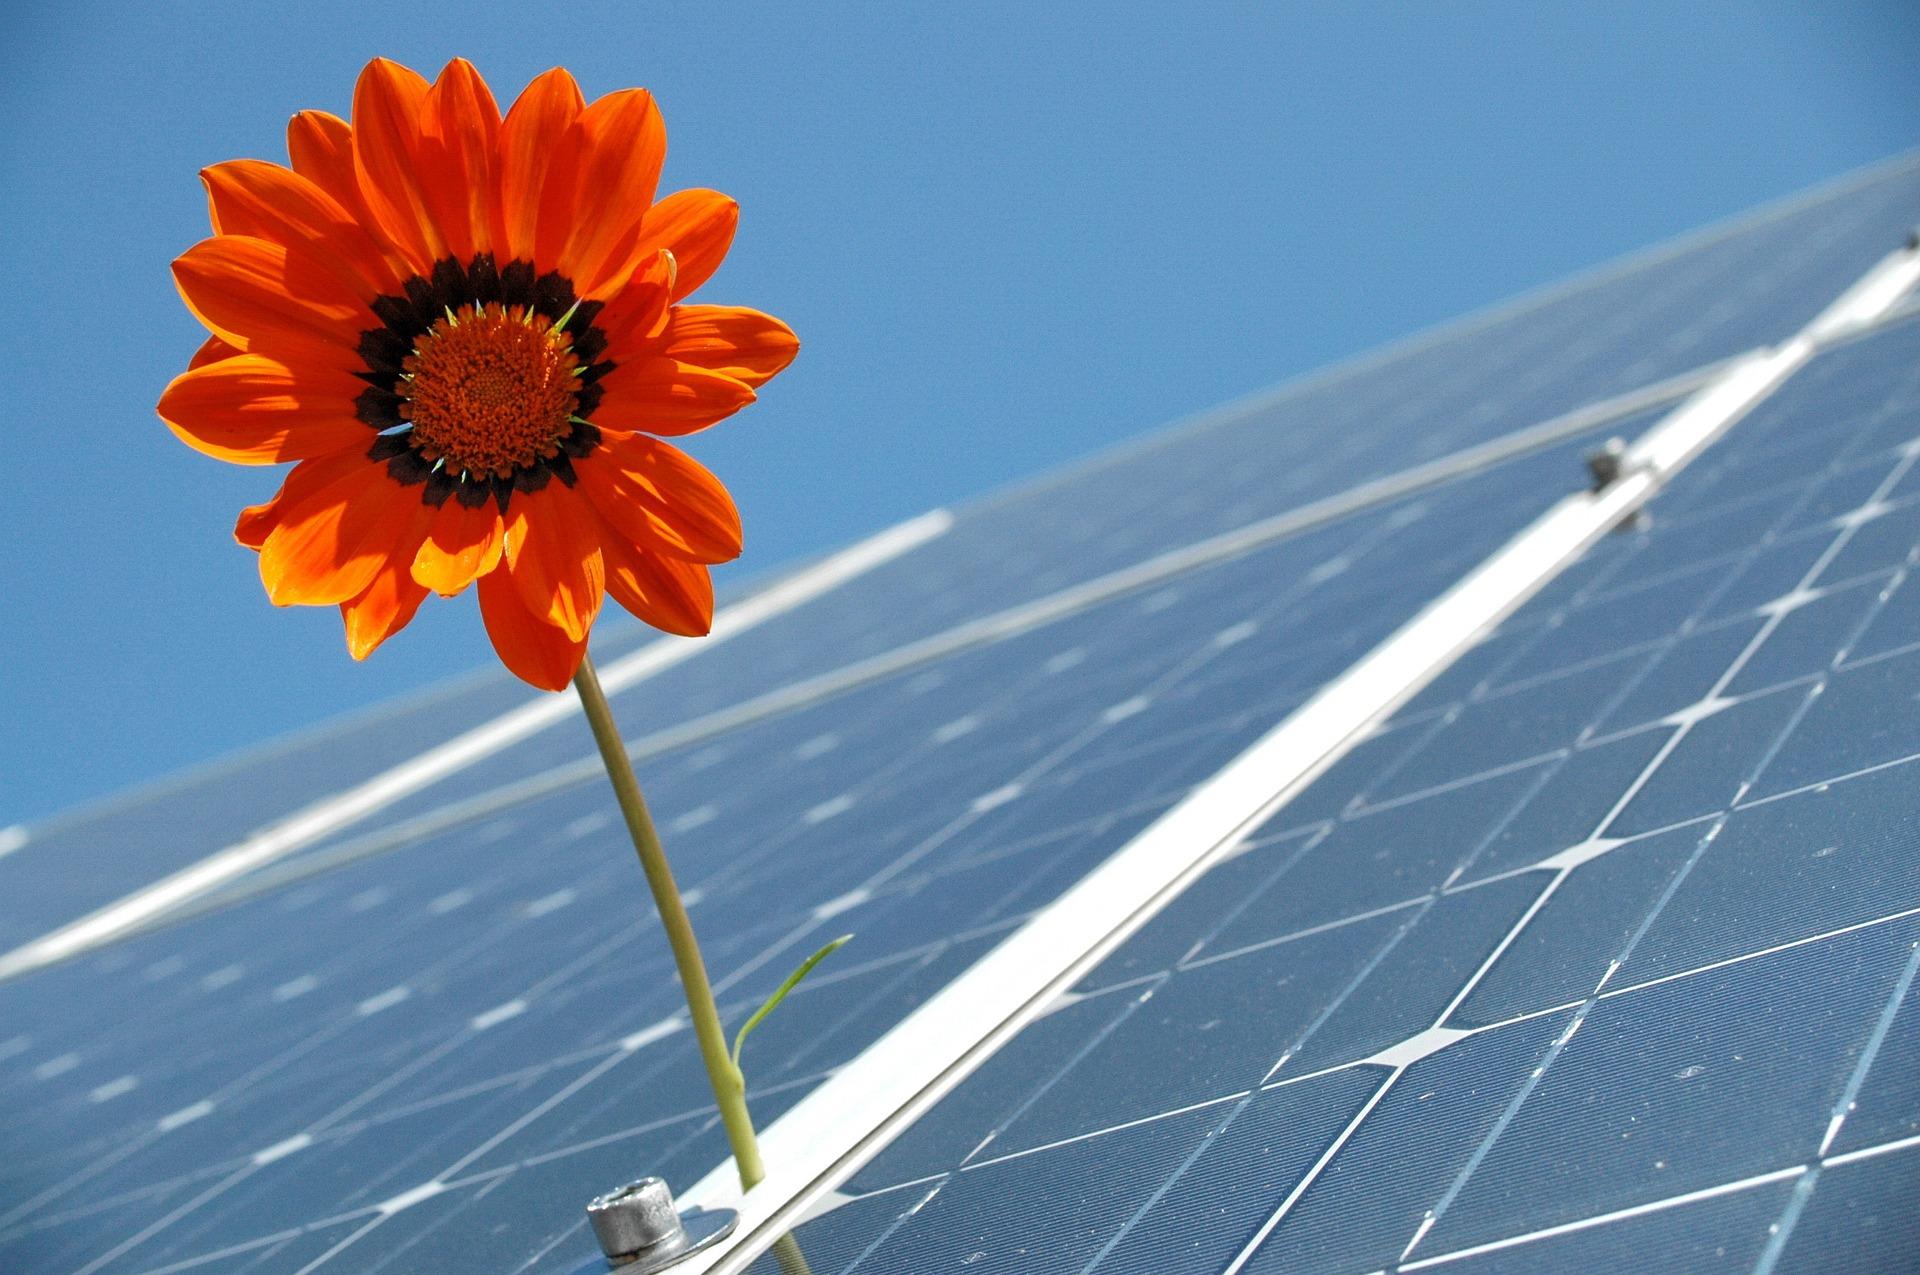 Solarpanel mit roter Blume